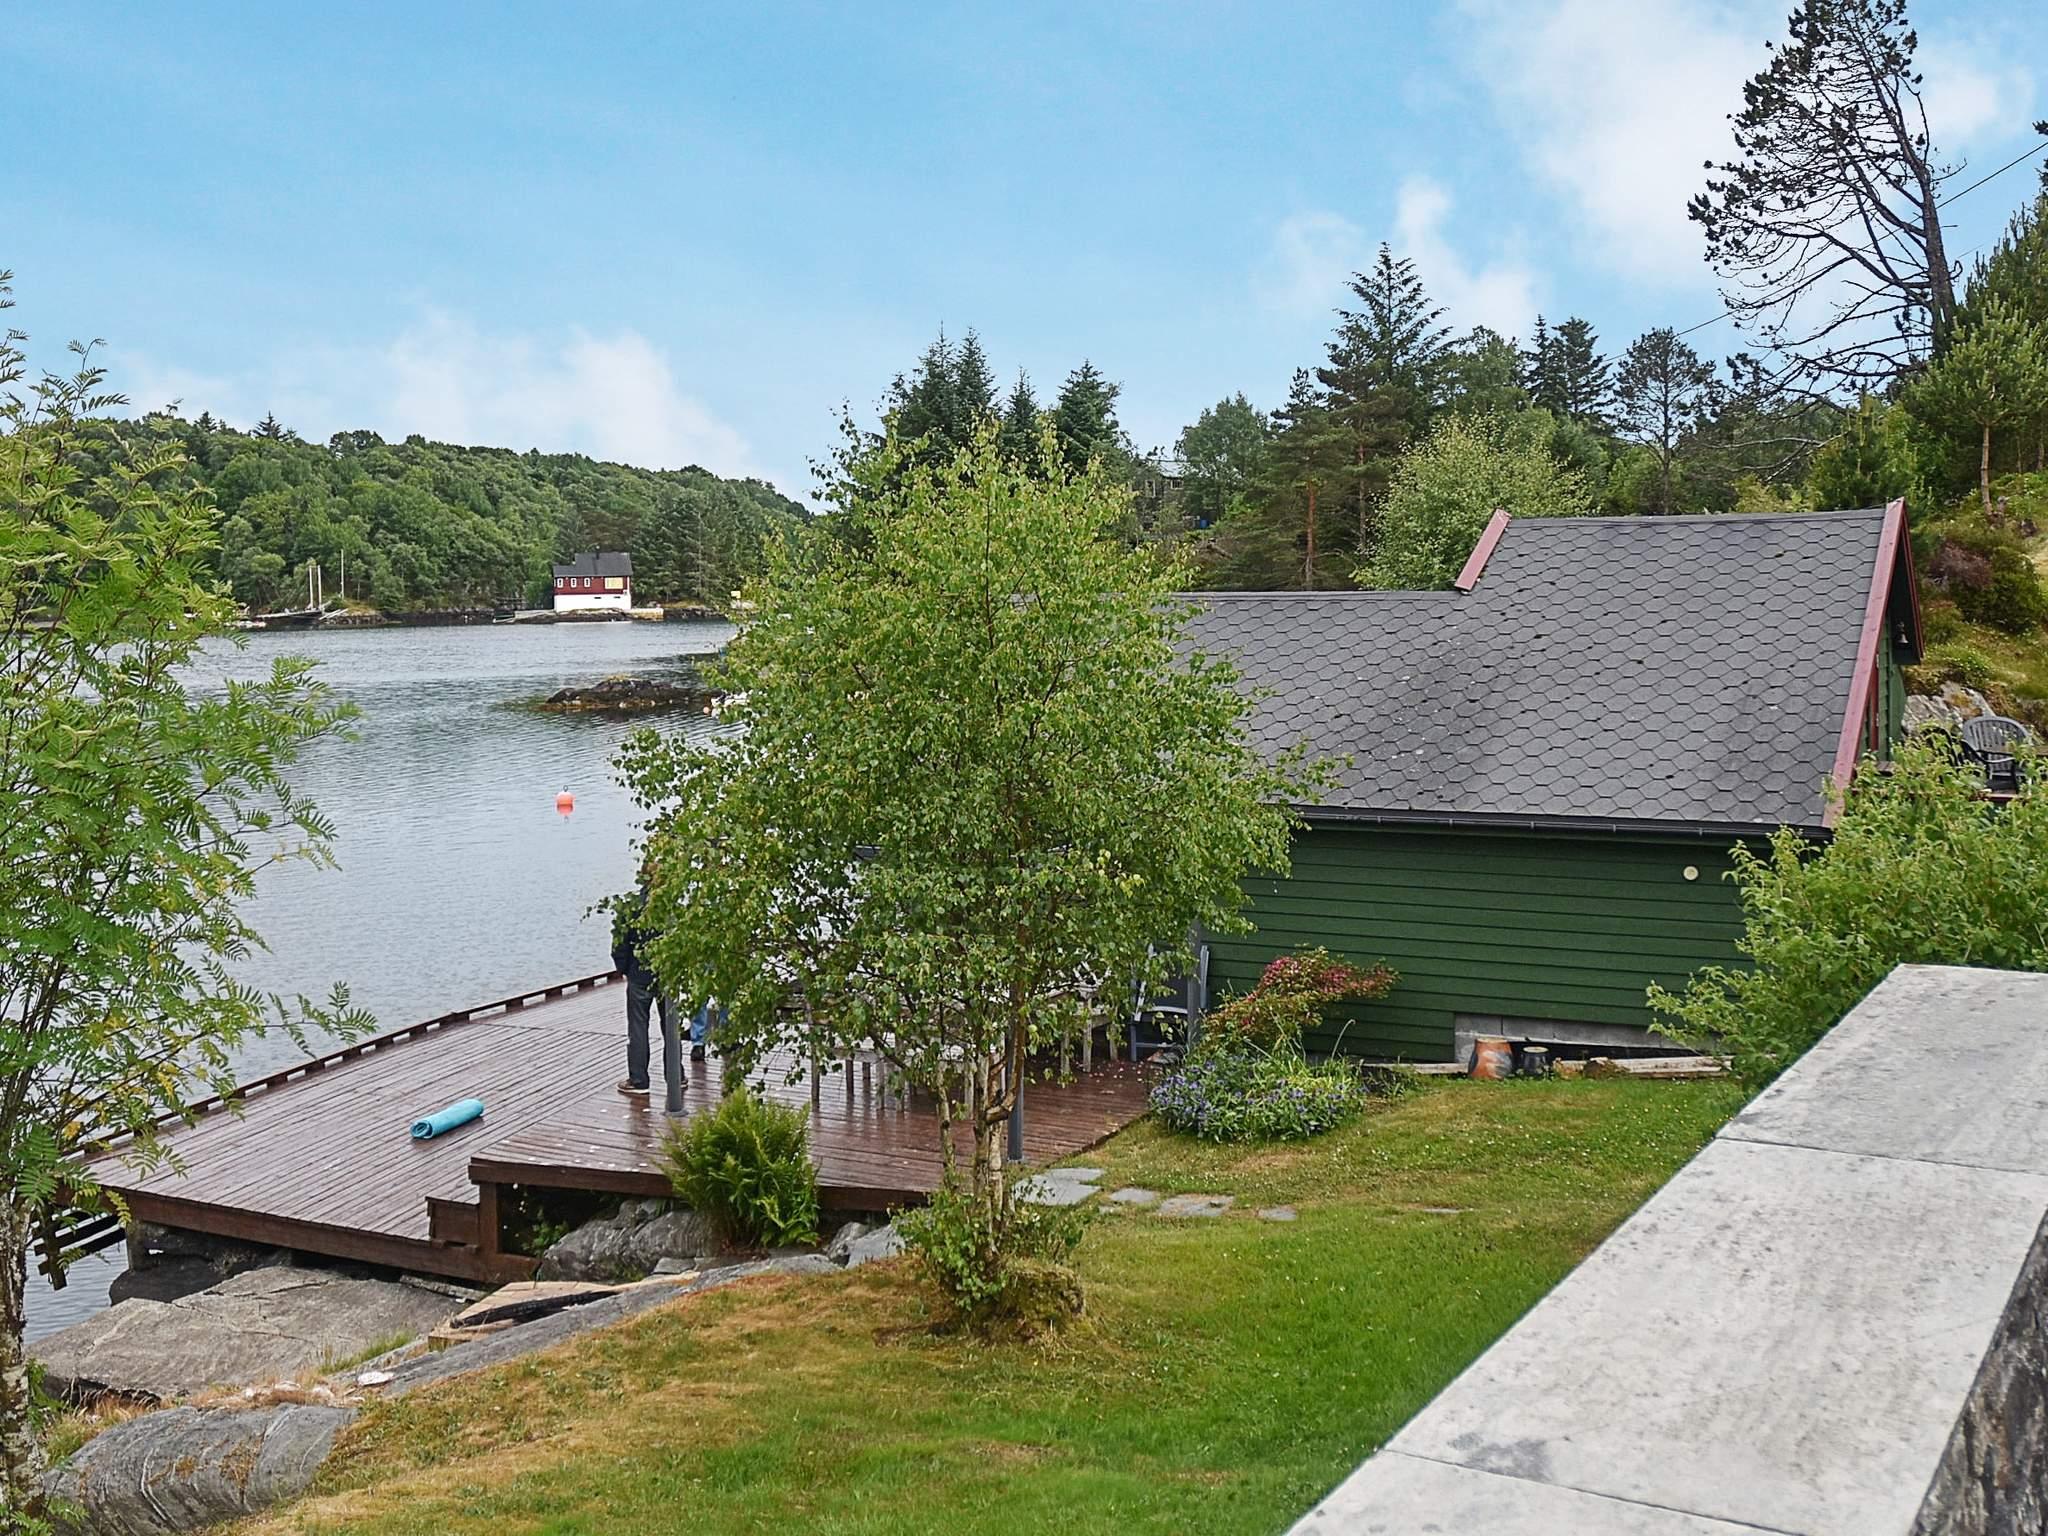 Ferienhaus Mølstrevåg (2463451), Sveio, Hordaland - Hardangerfjord, Westnorwegen, Norwegen, Bild 22